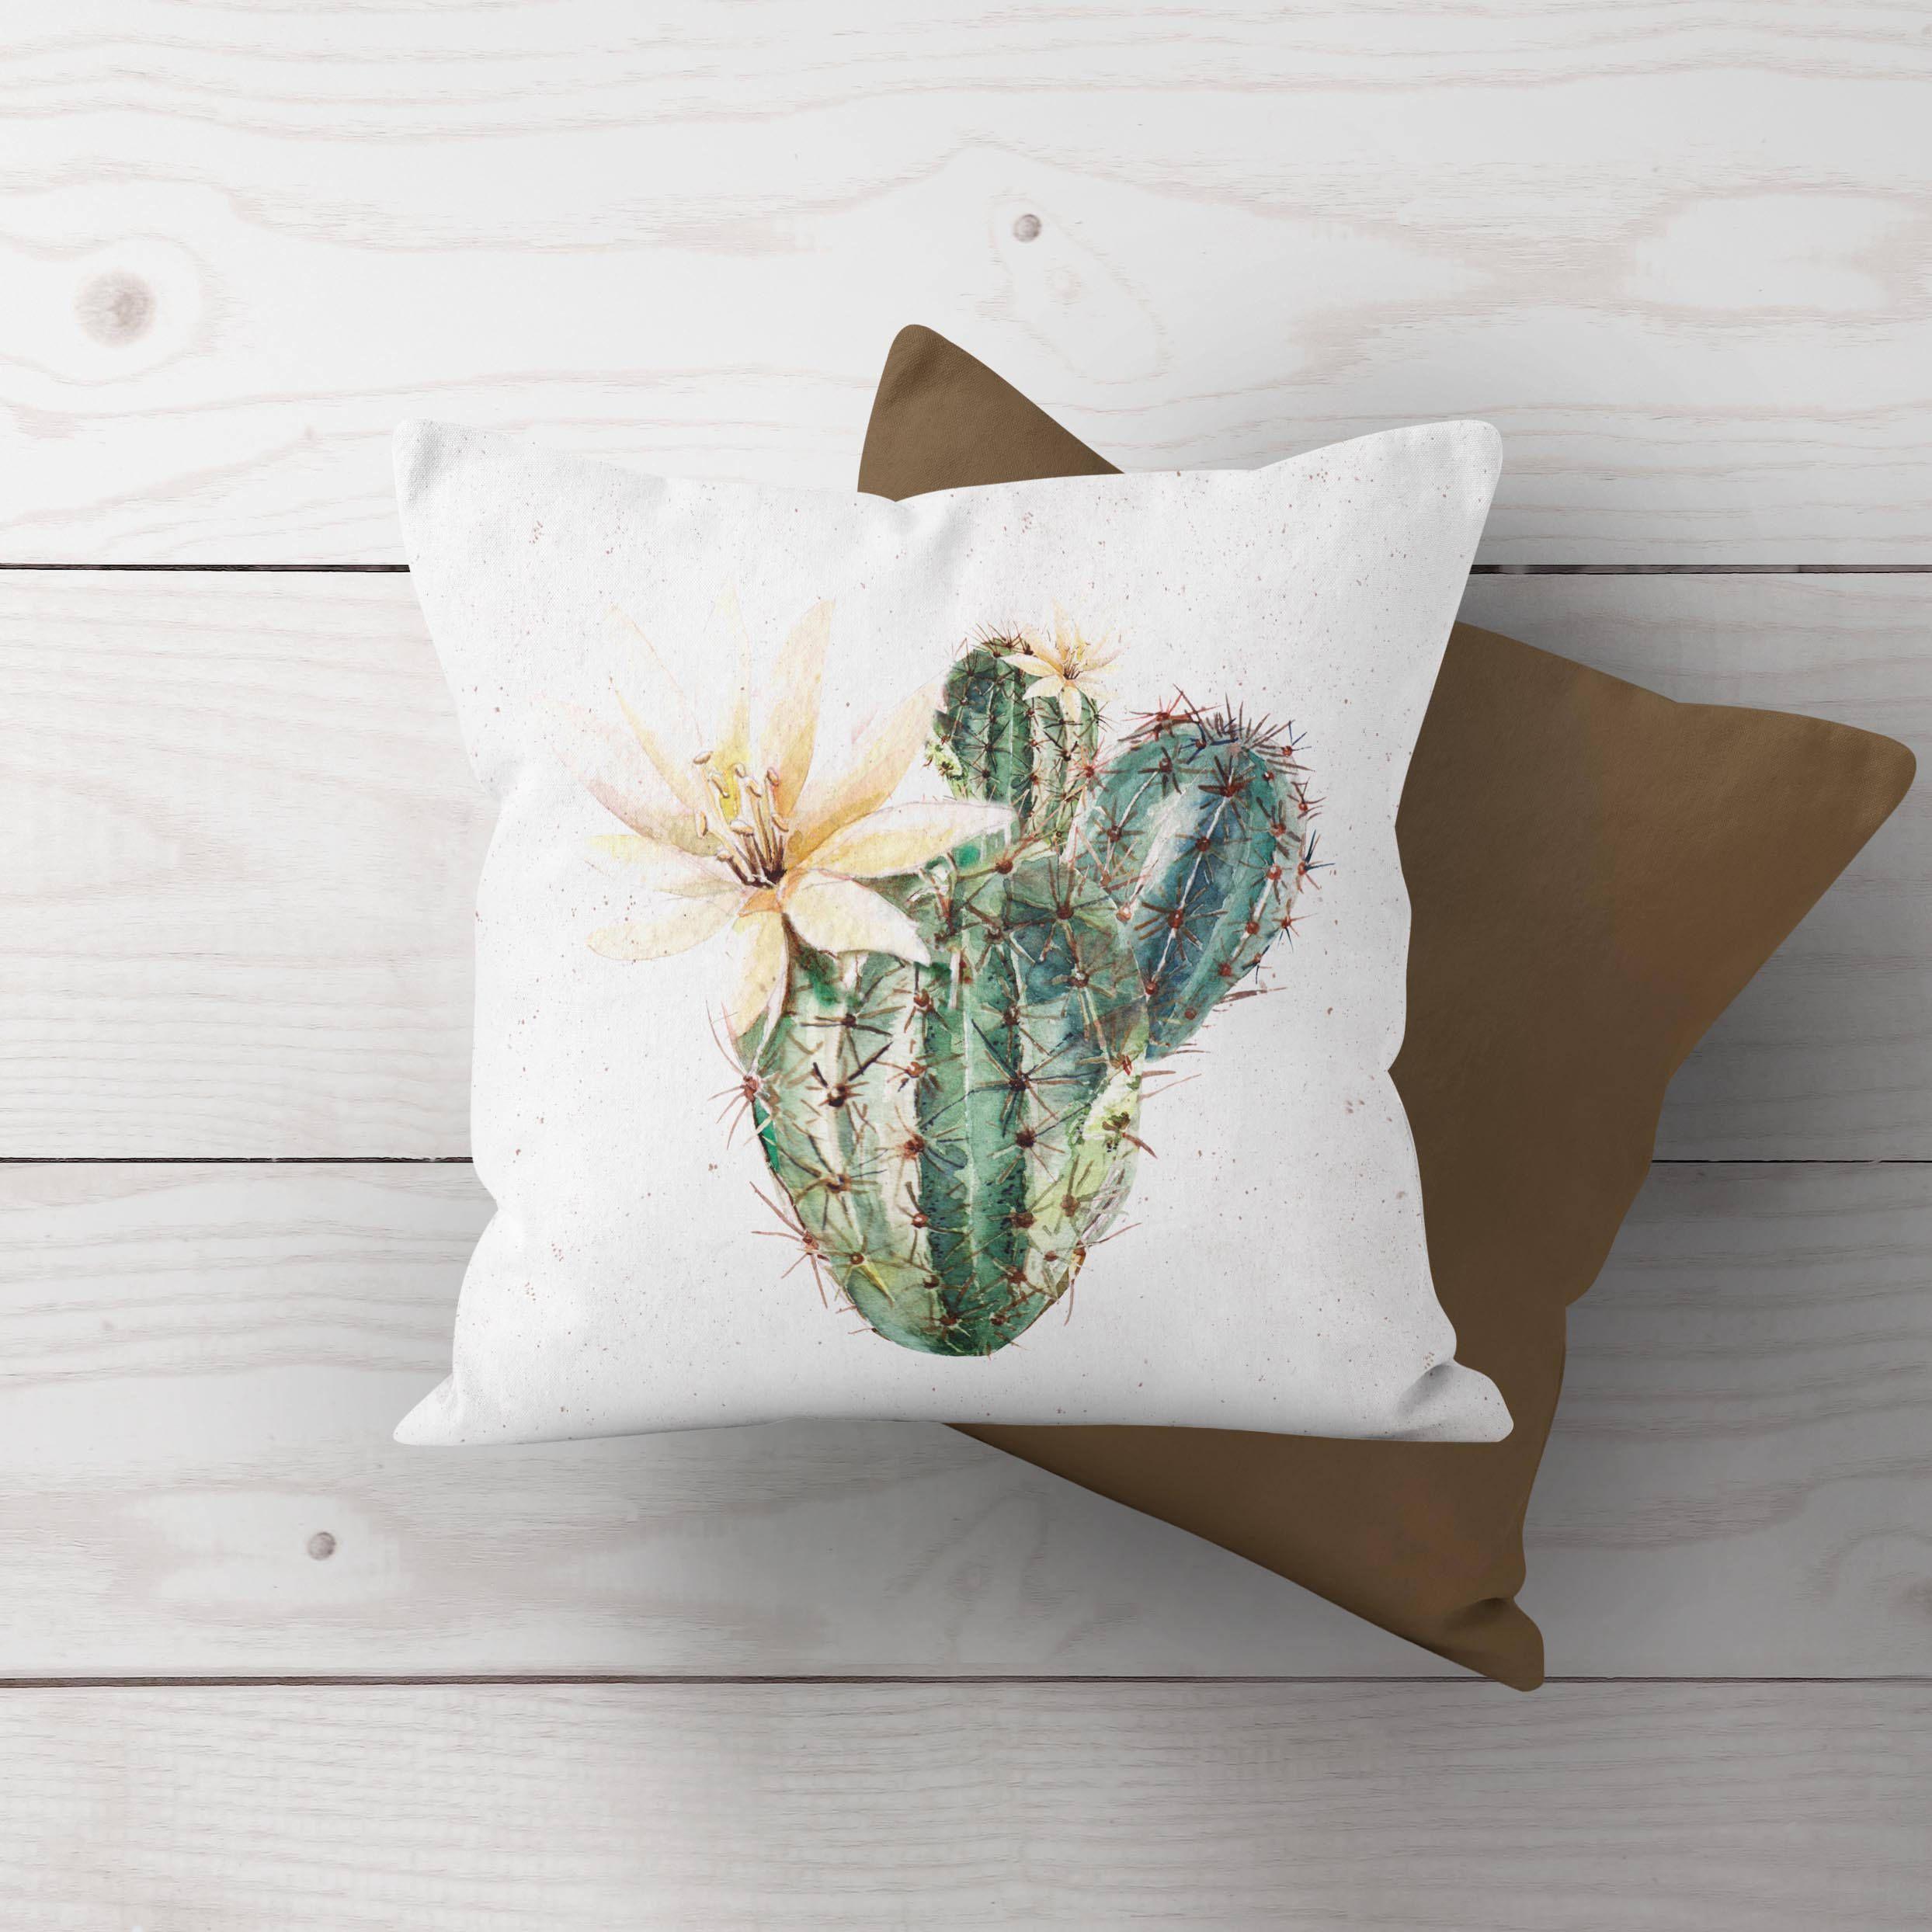 Boho Farmhouse Prickly Pear Cactus Throw Pillow Cover Cactus Throw Pillows Throw Pillows Cactus Pillow